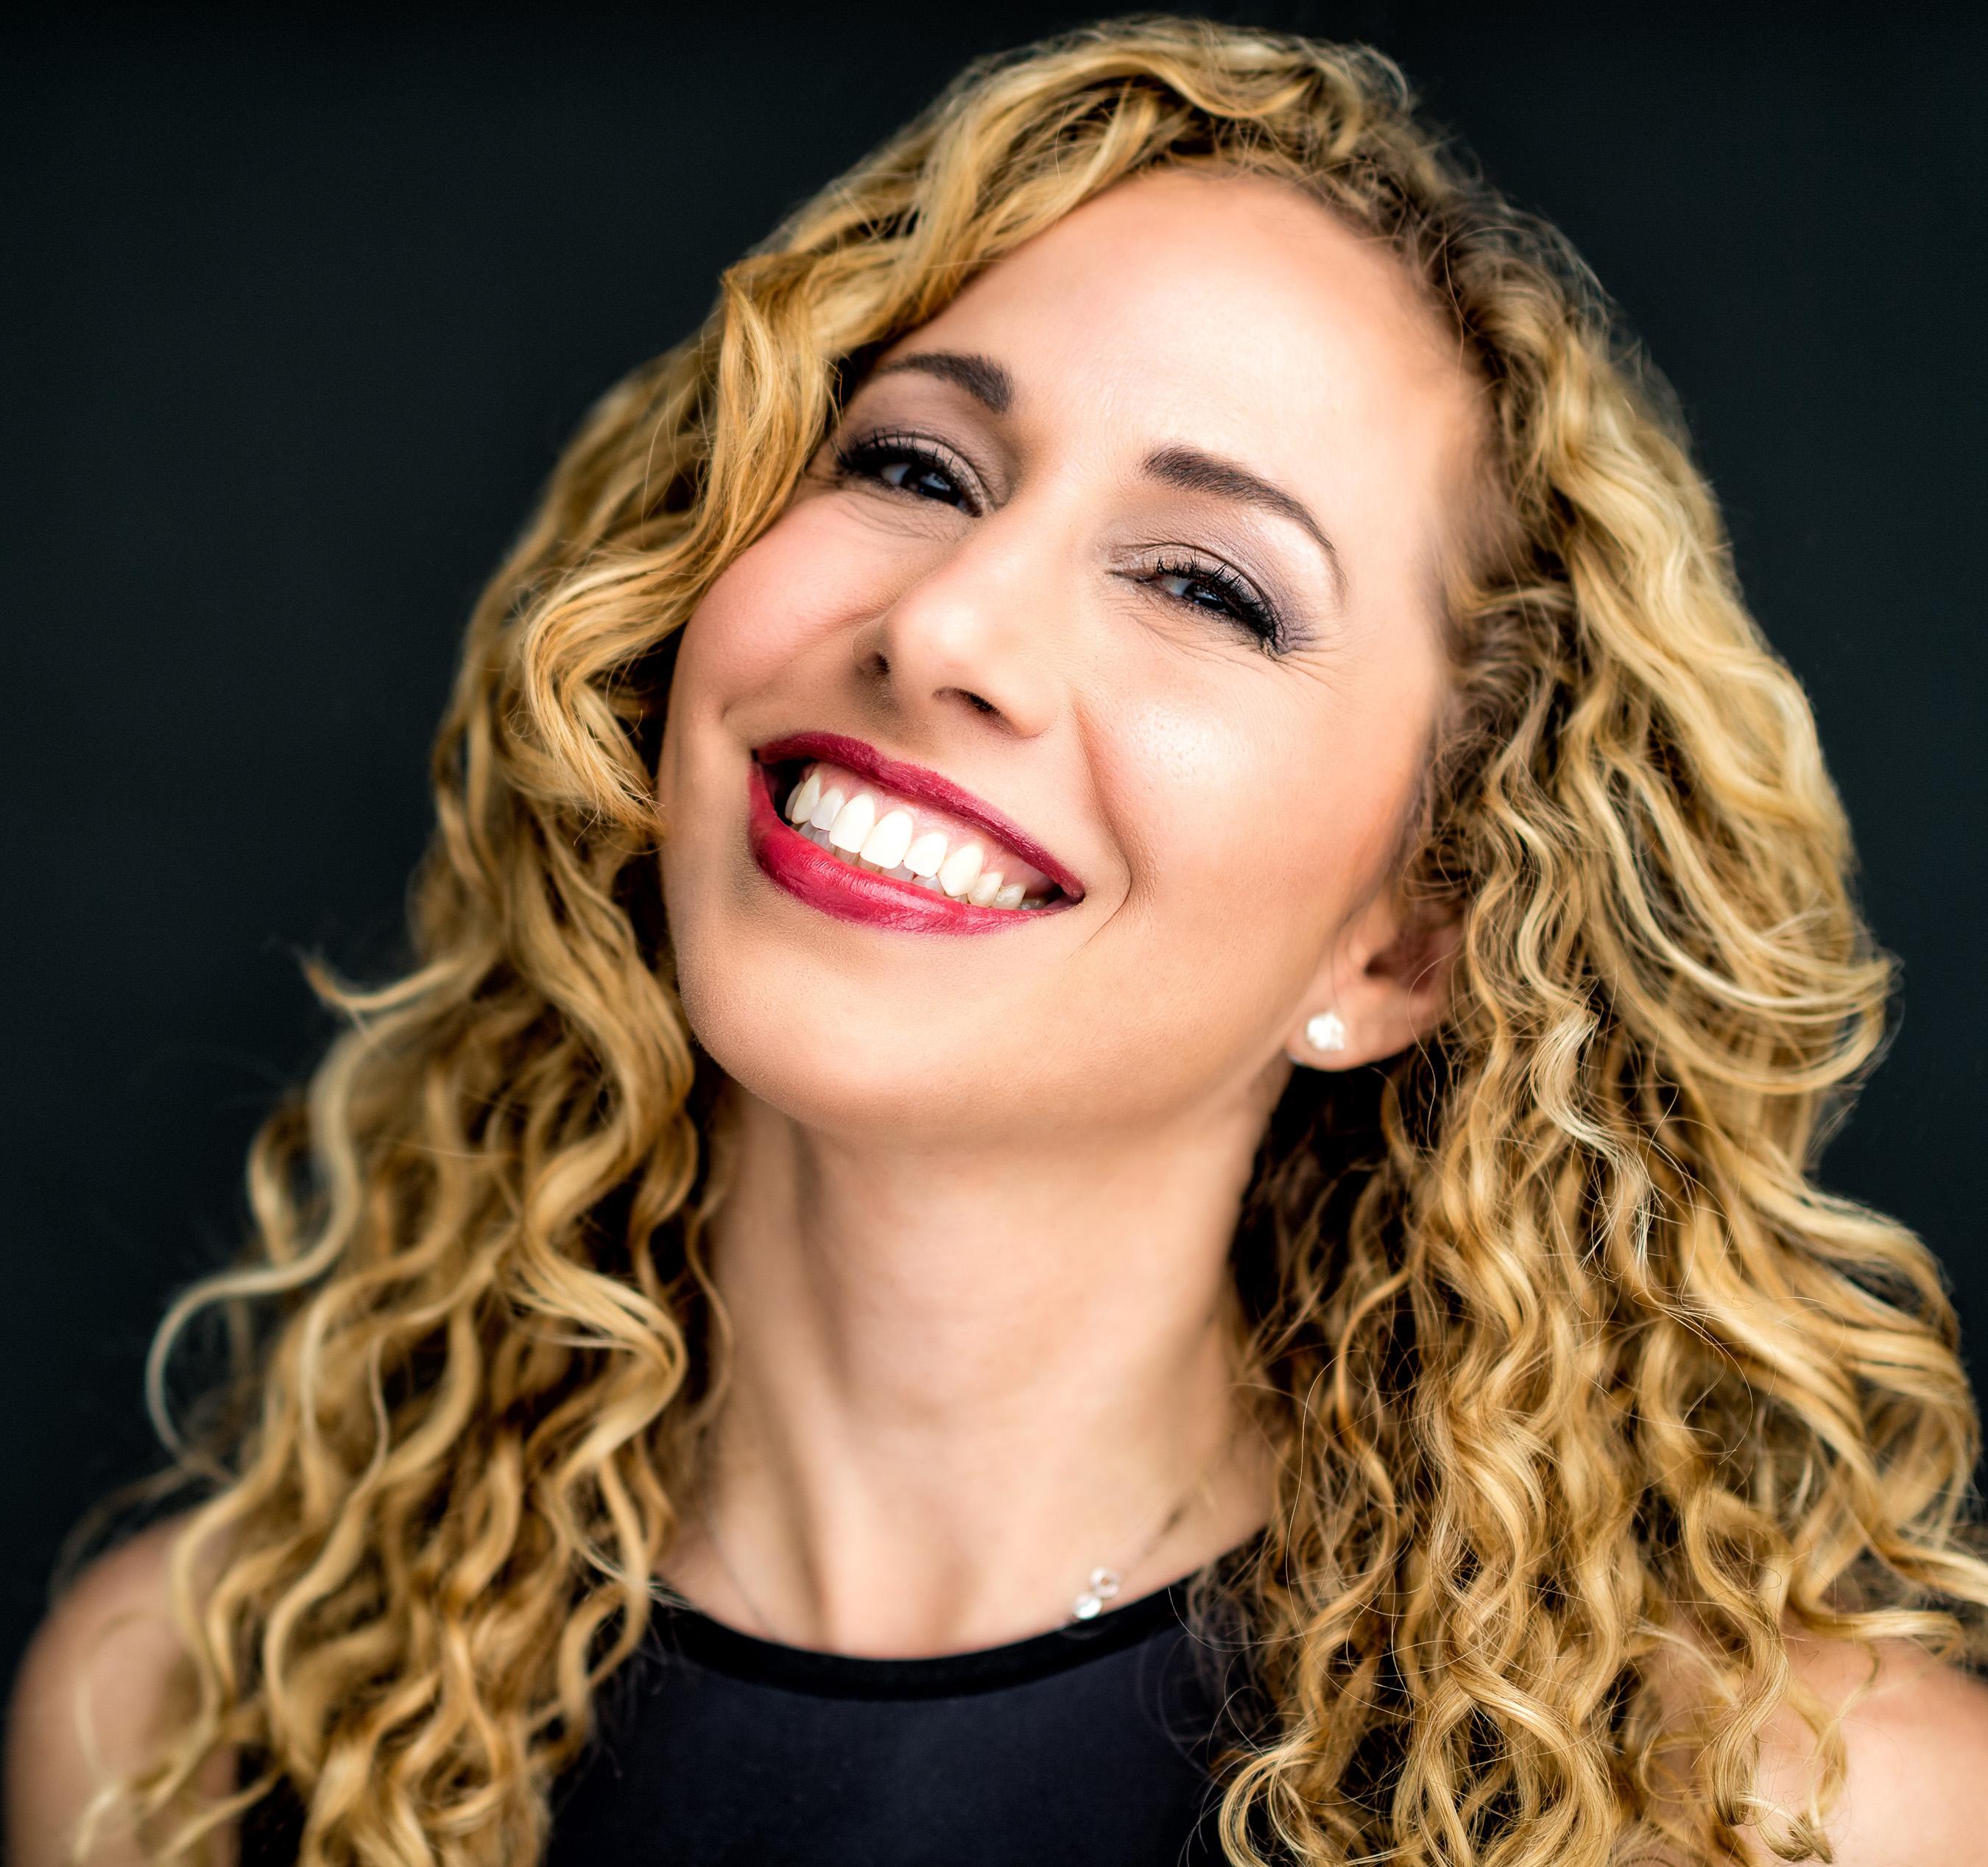 Jeanette Kaplun